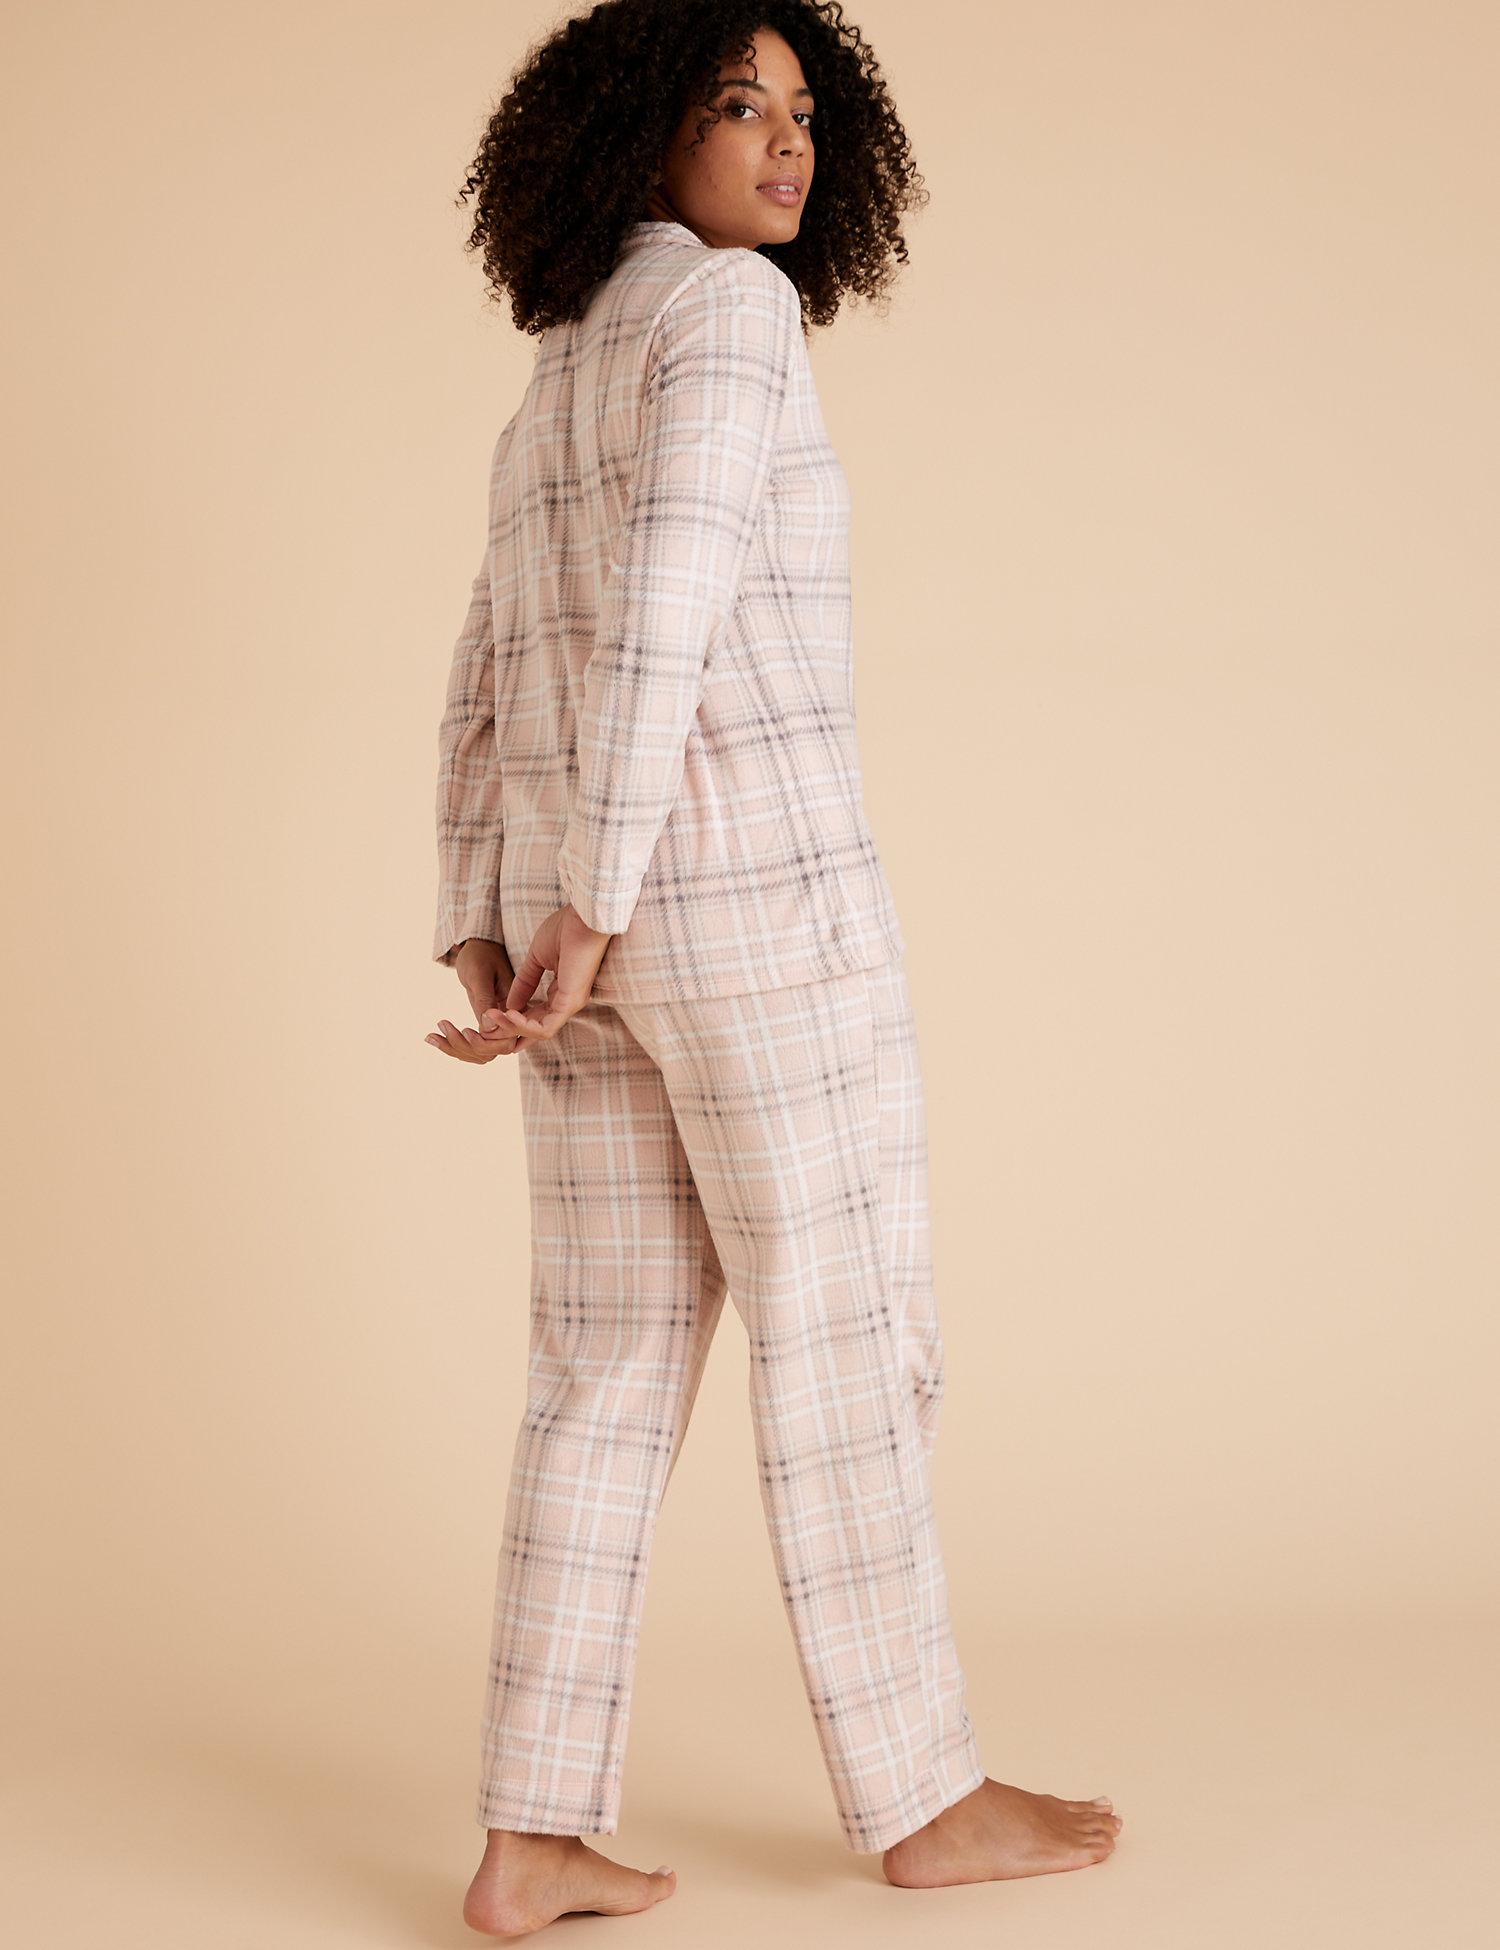 Pyjama set winter wardrobe